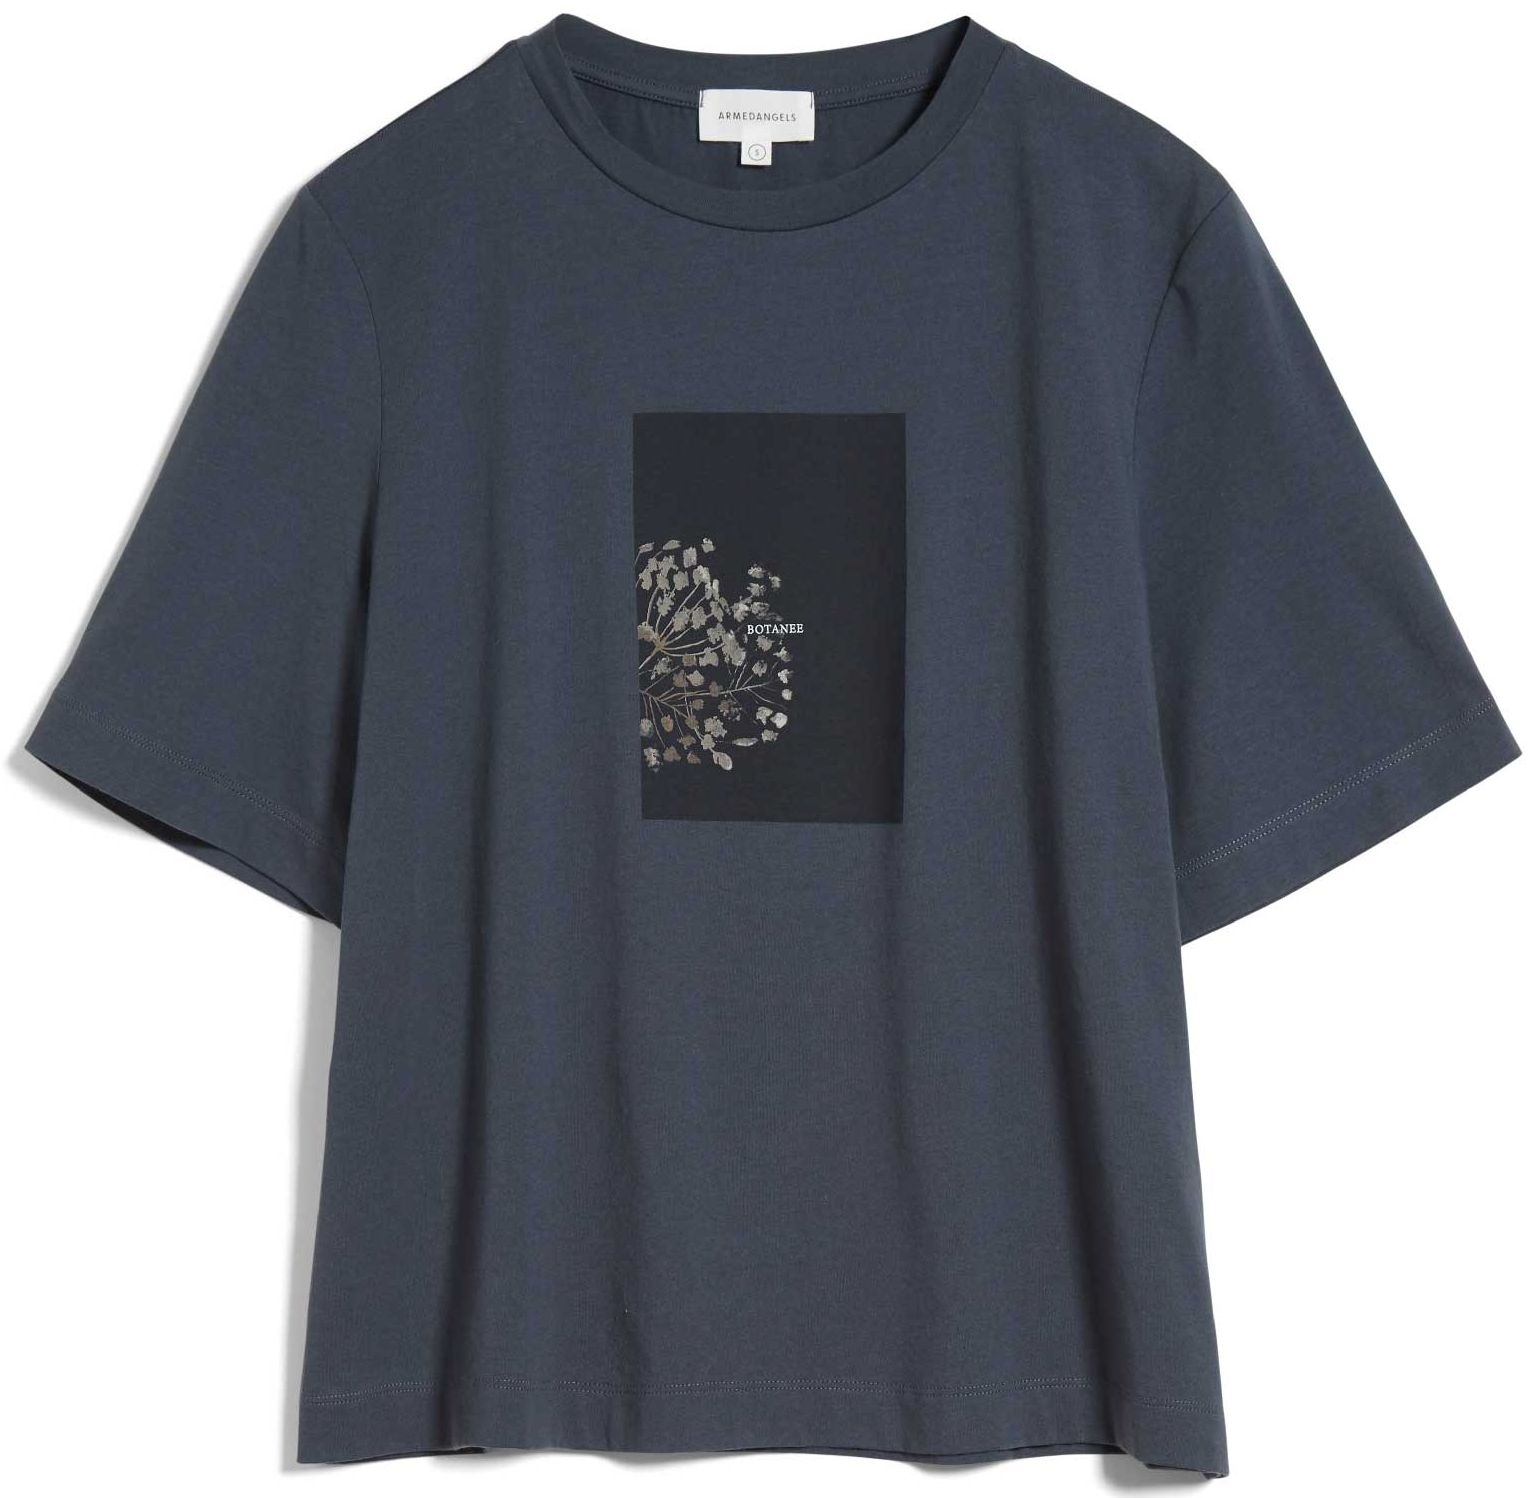 Damen-Shirt LAYAA BOTANEE indigo